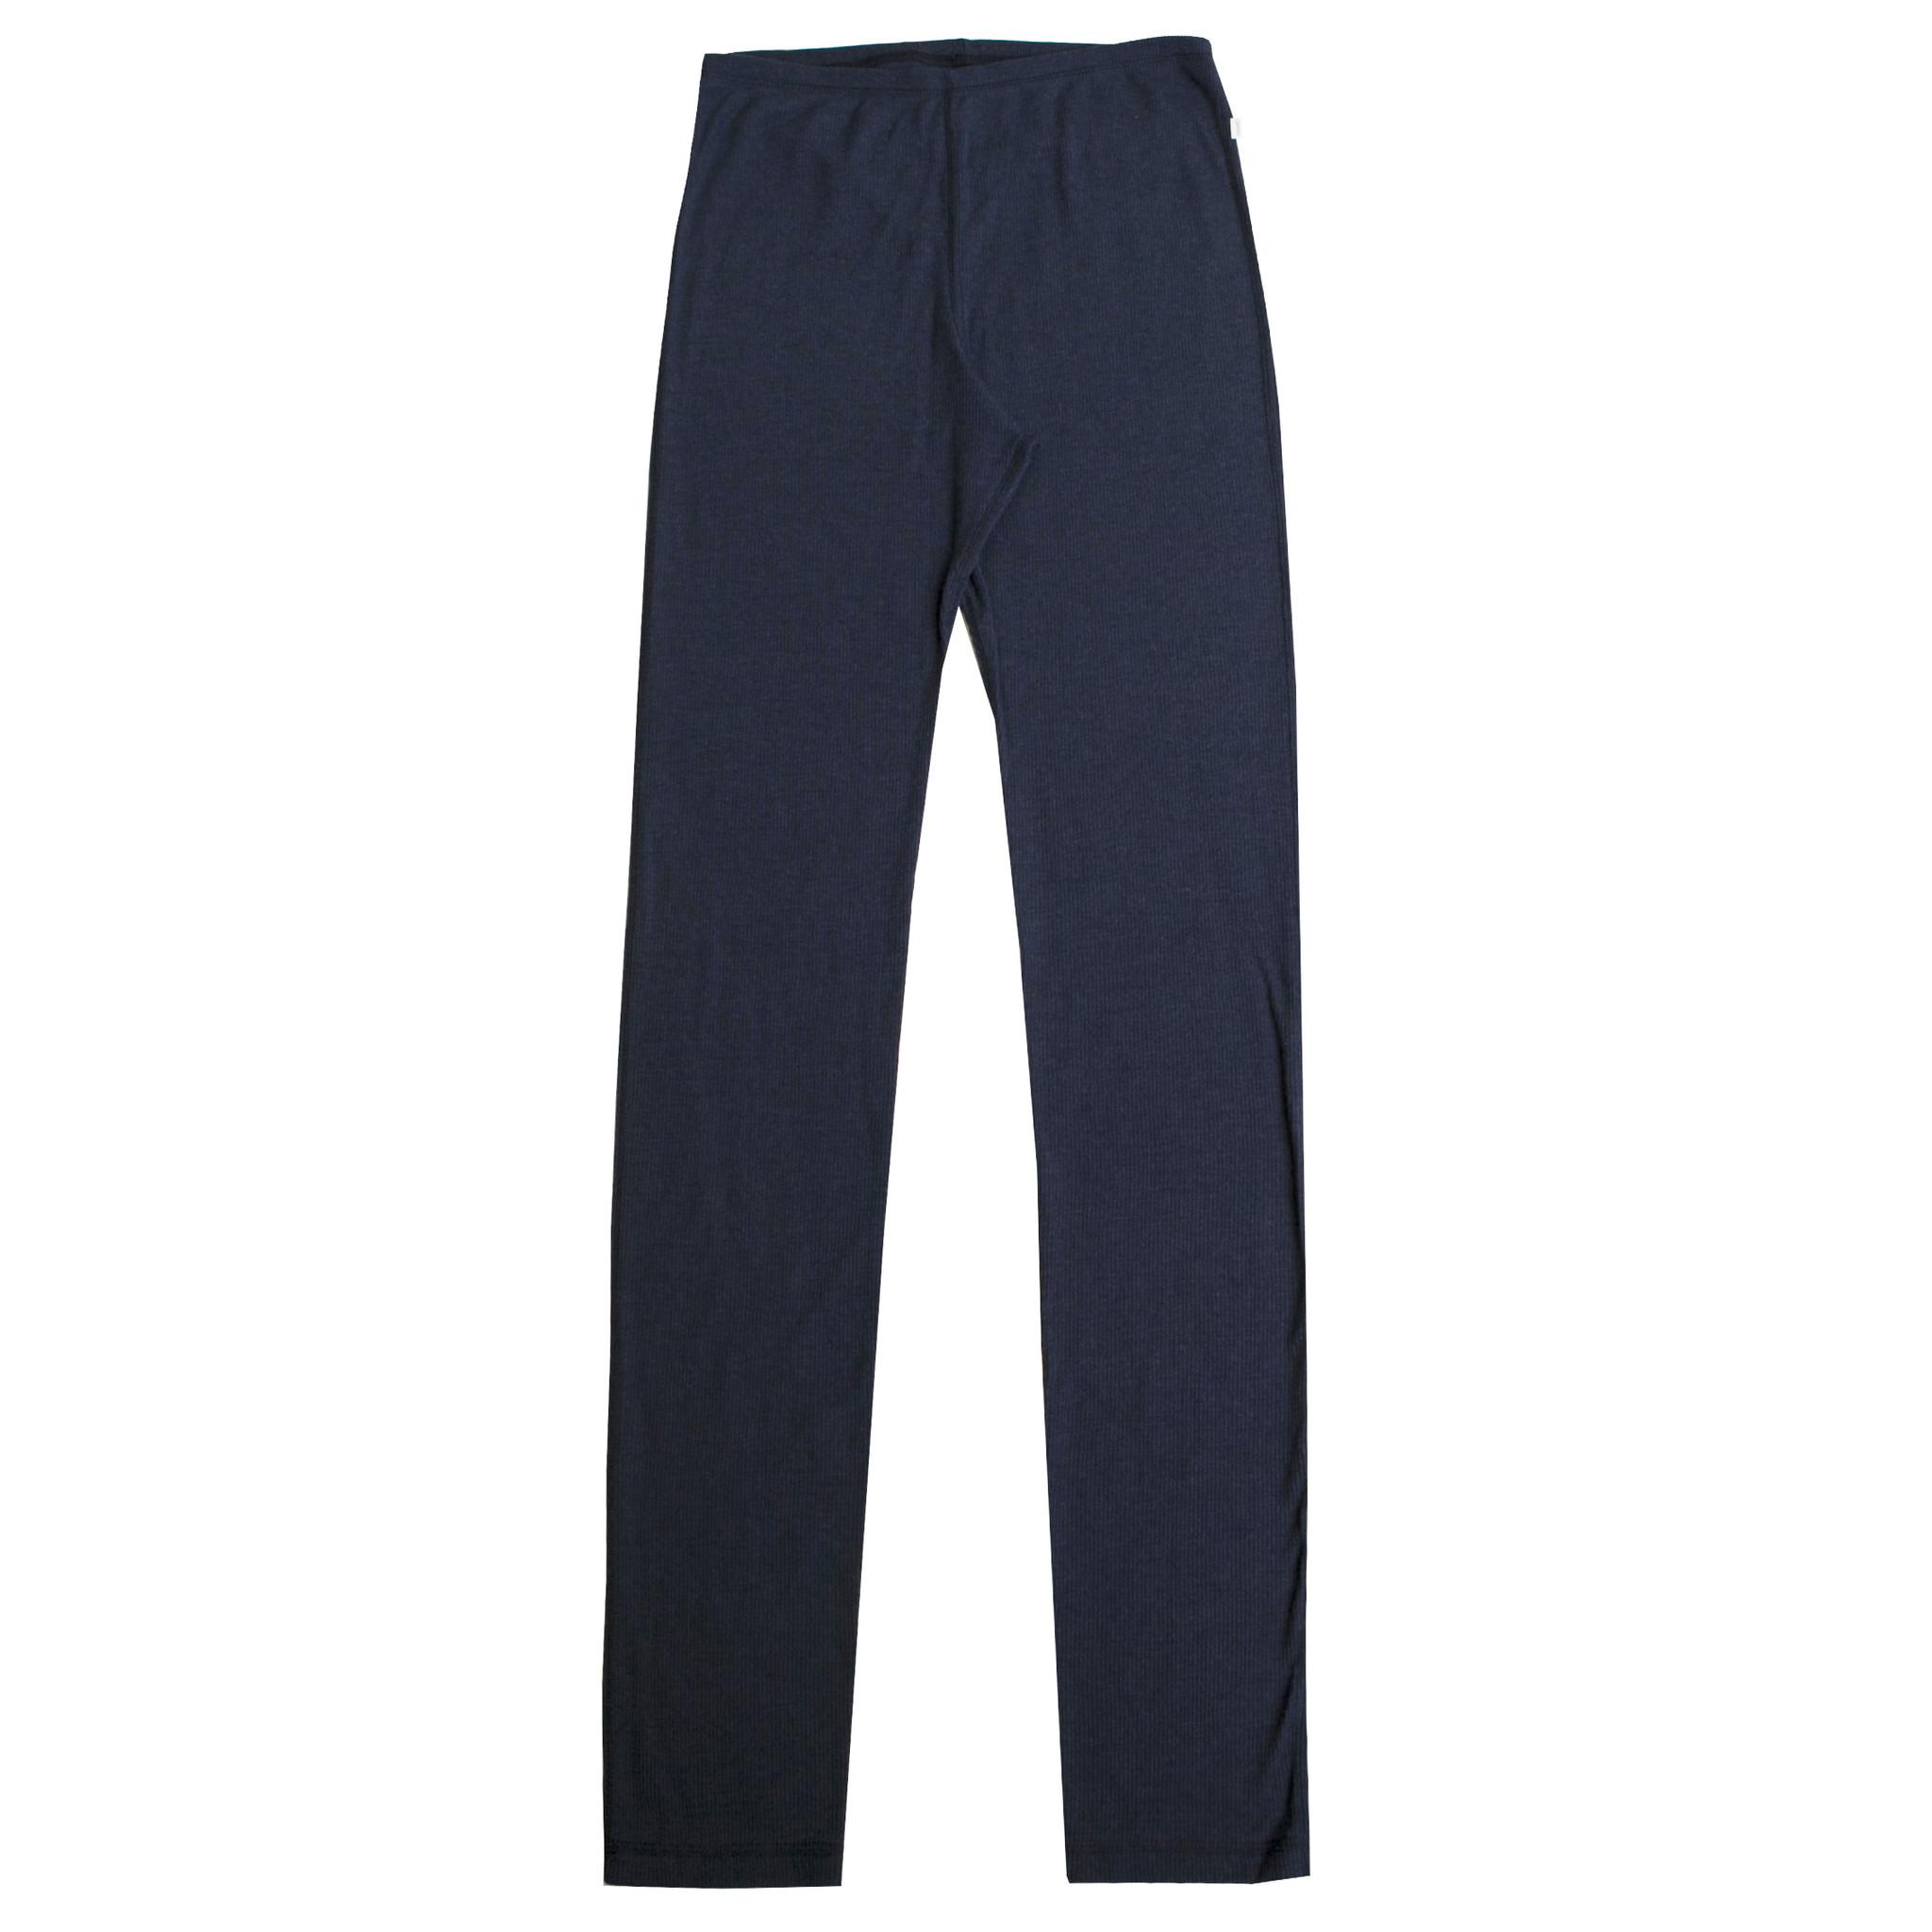 Legging - merino wool-1